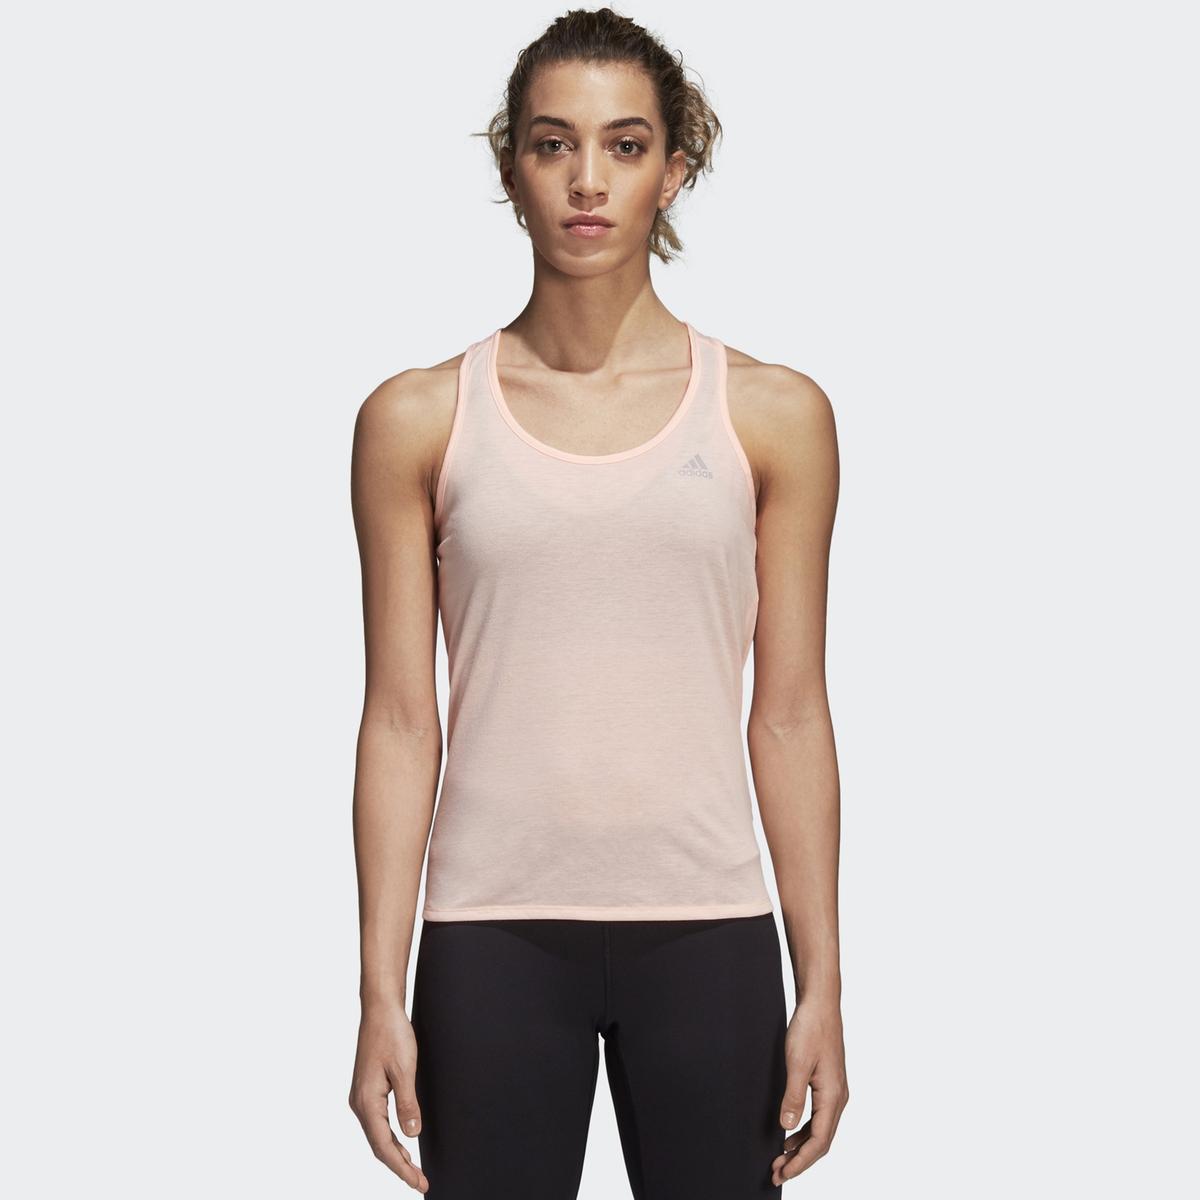 Camiseta sin mangas TRAINING PRIME CZ7905